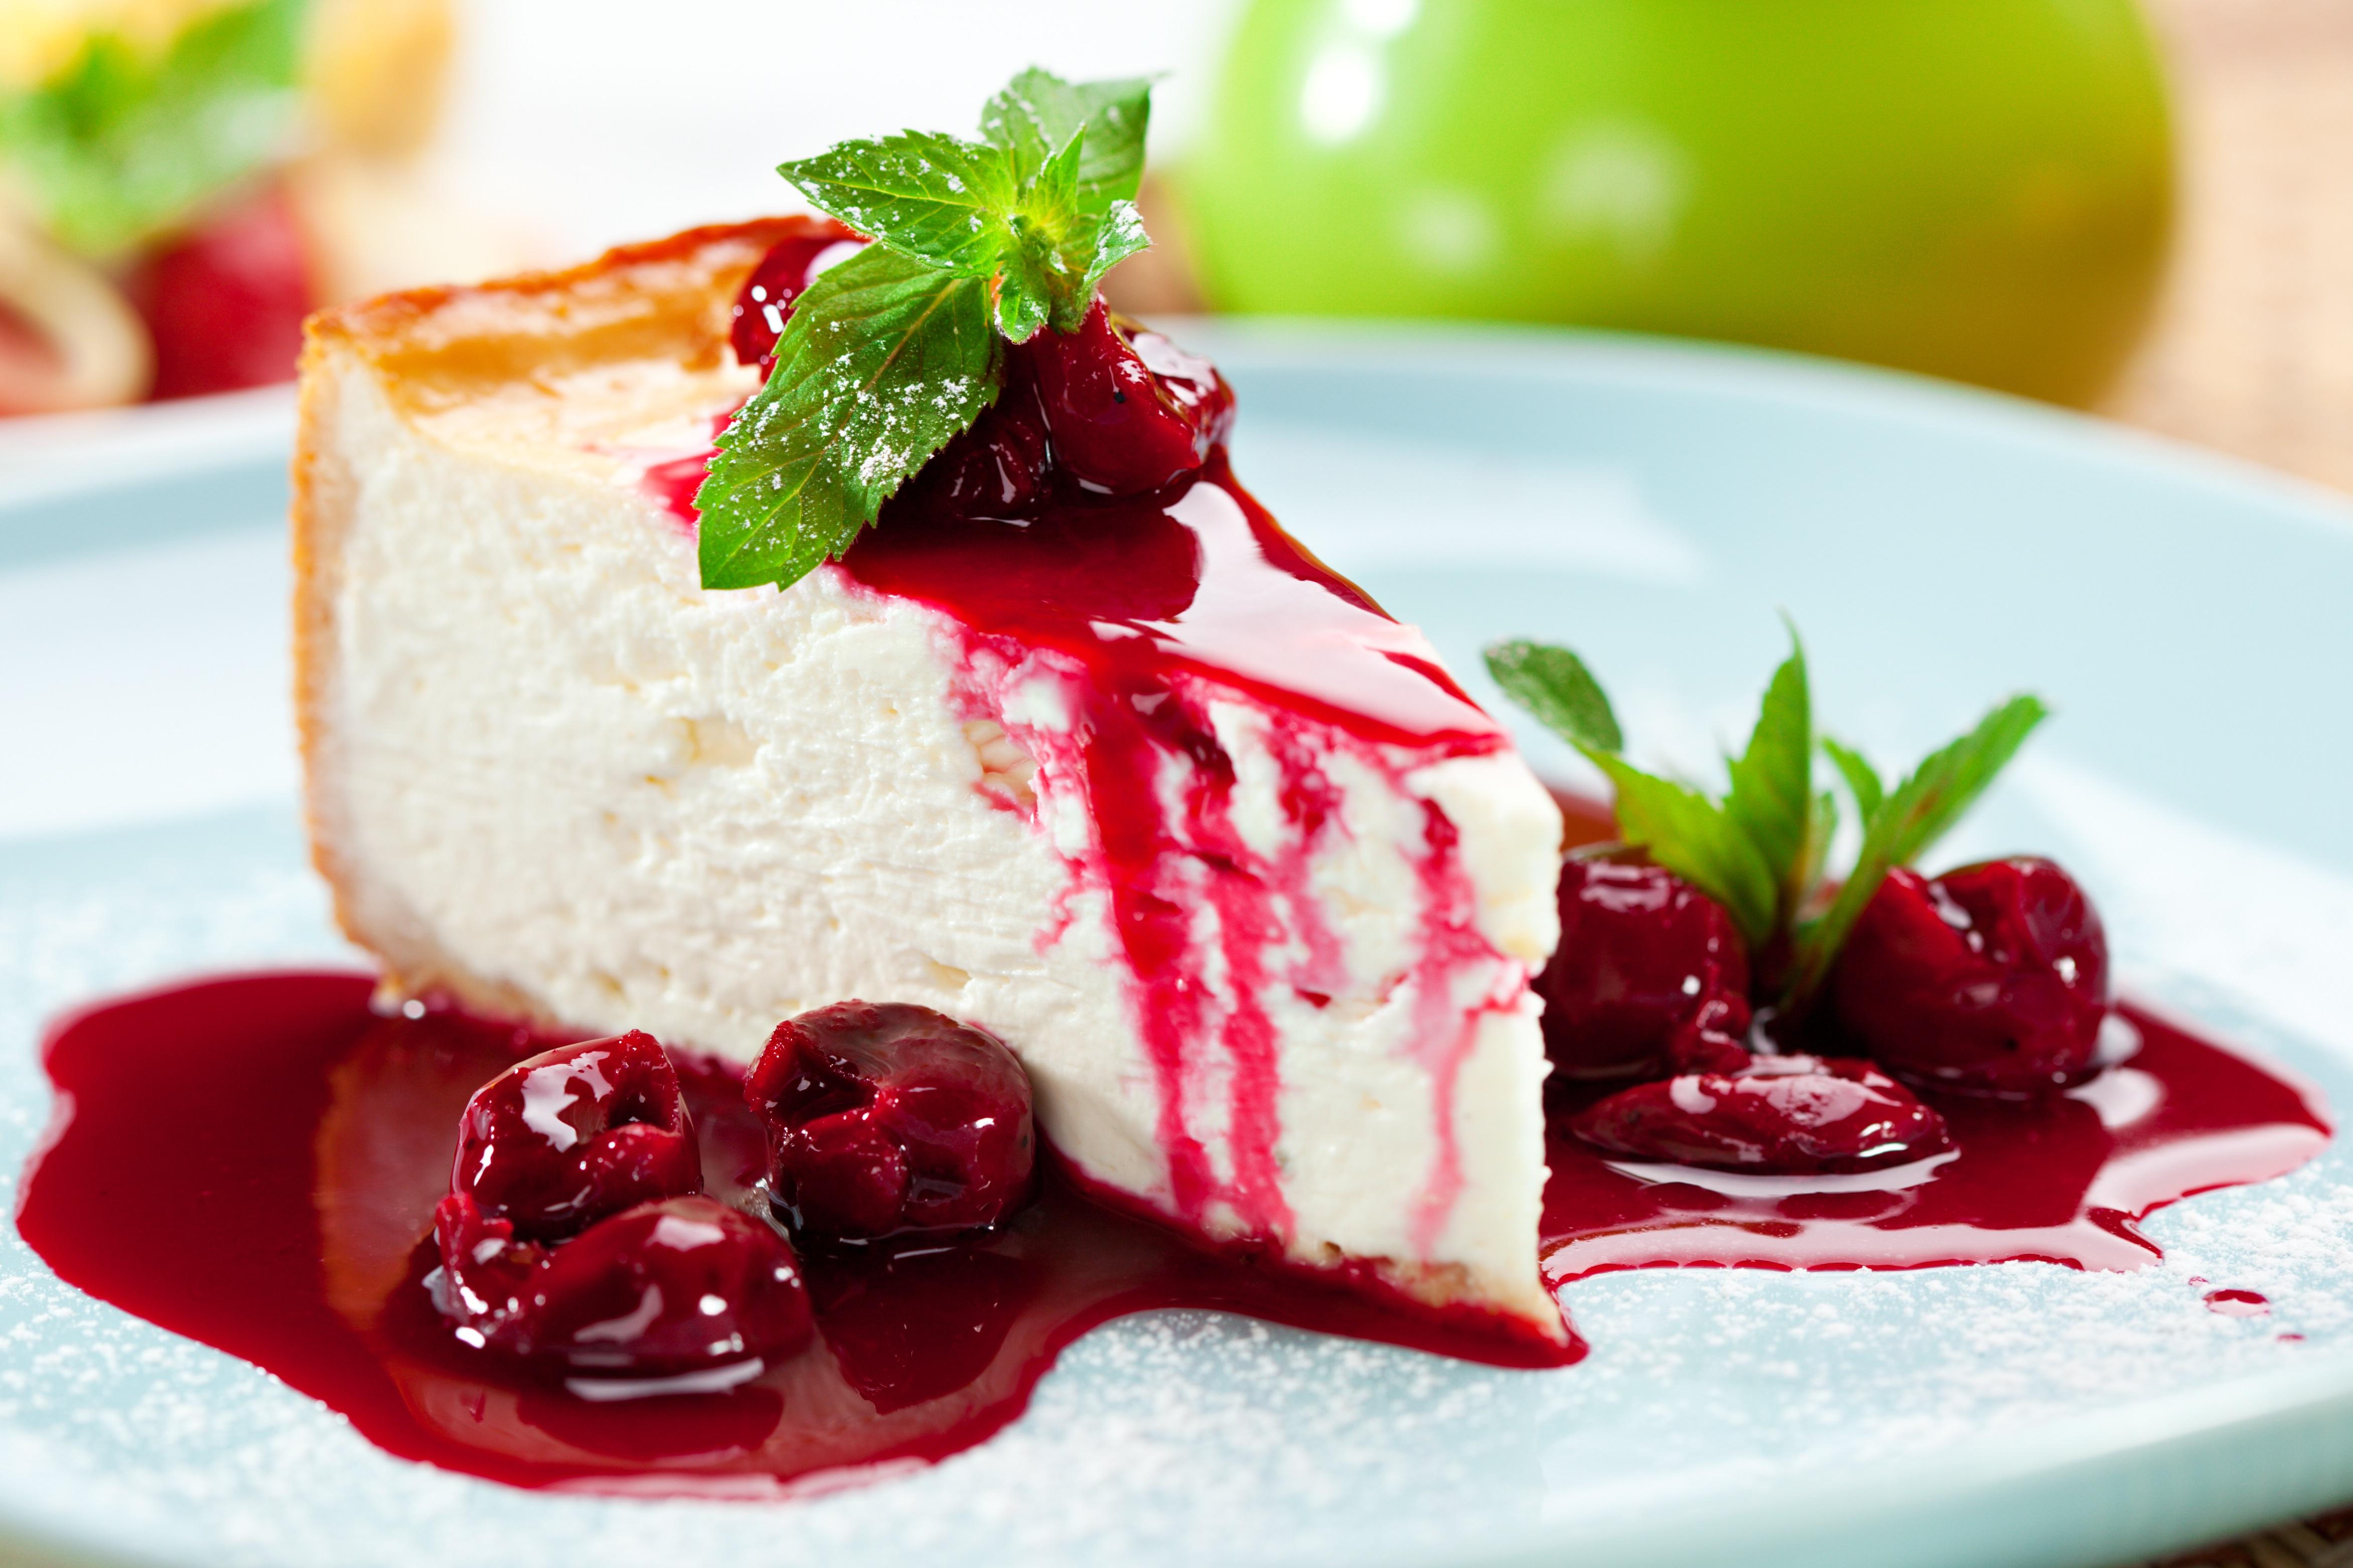 Pic: Cheesecake